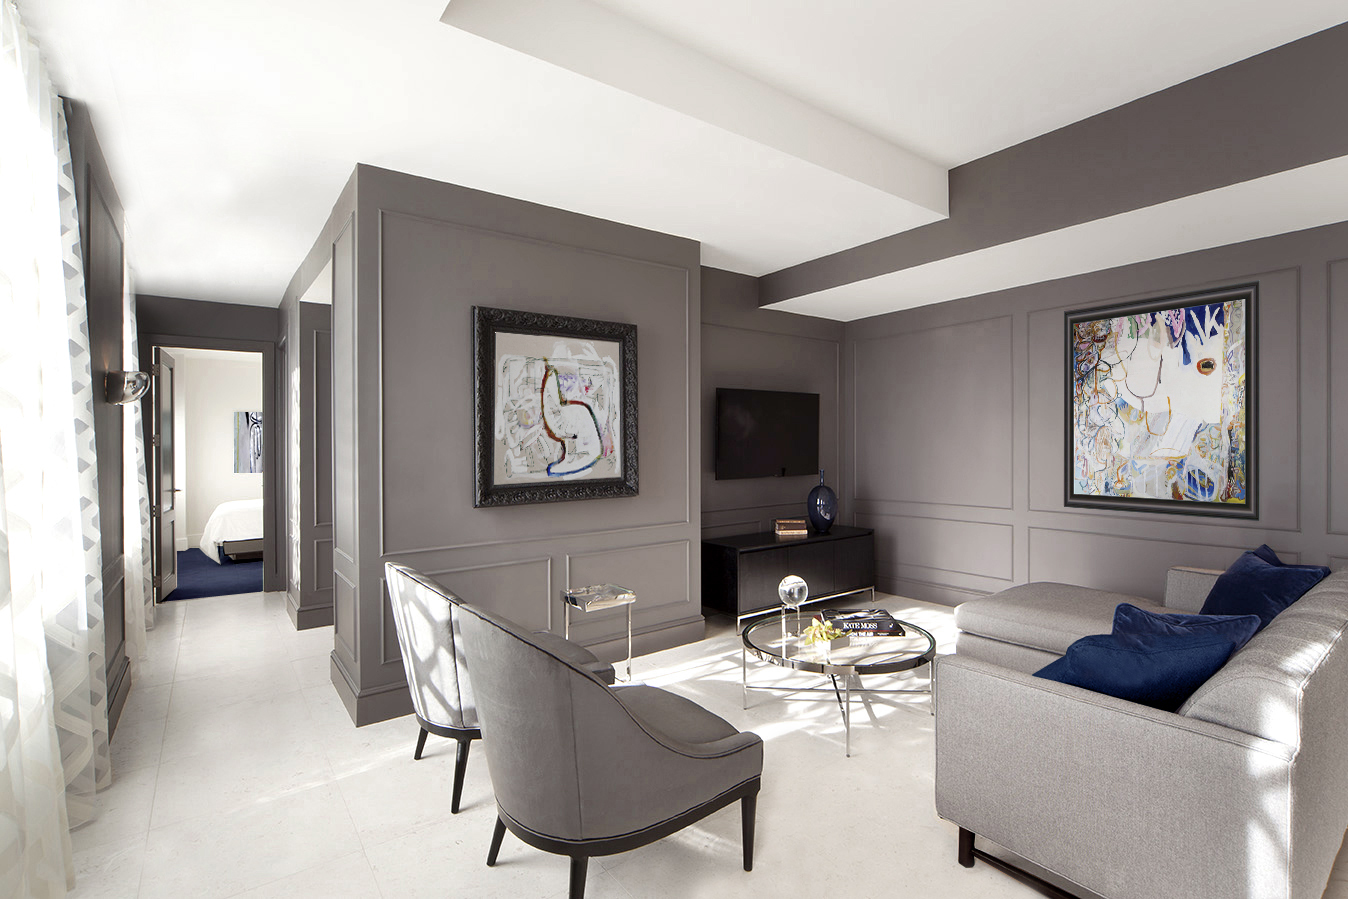 Luxury Interior Design in Greenwich, CT   Joe Ginsberg Design